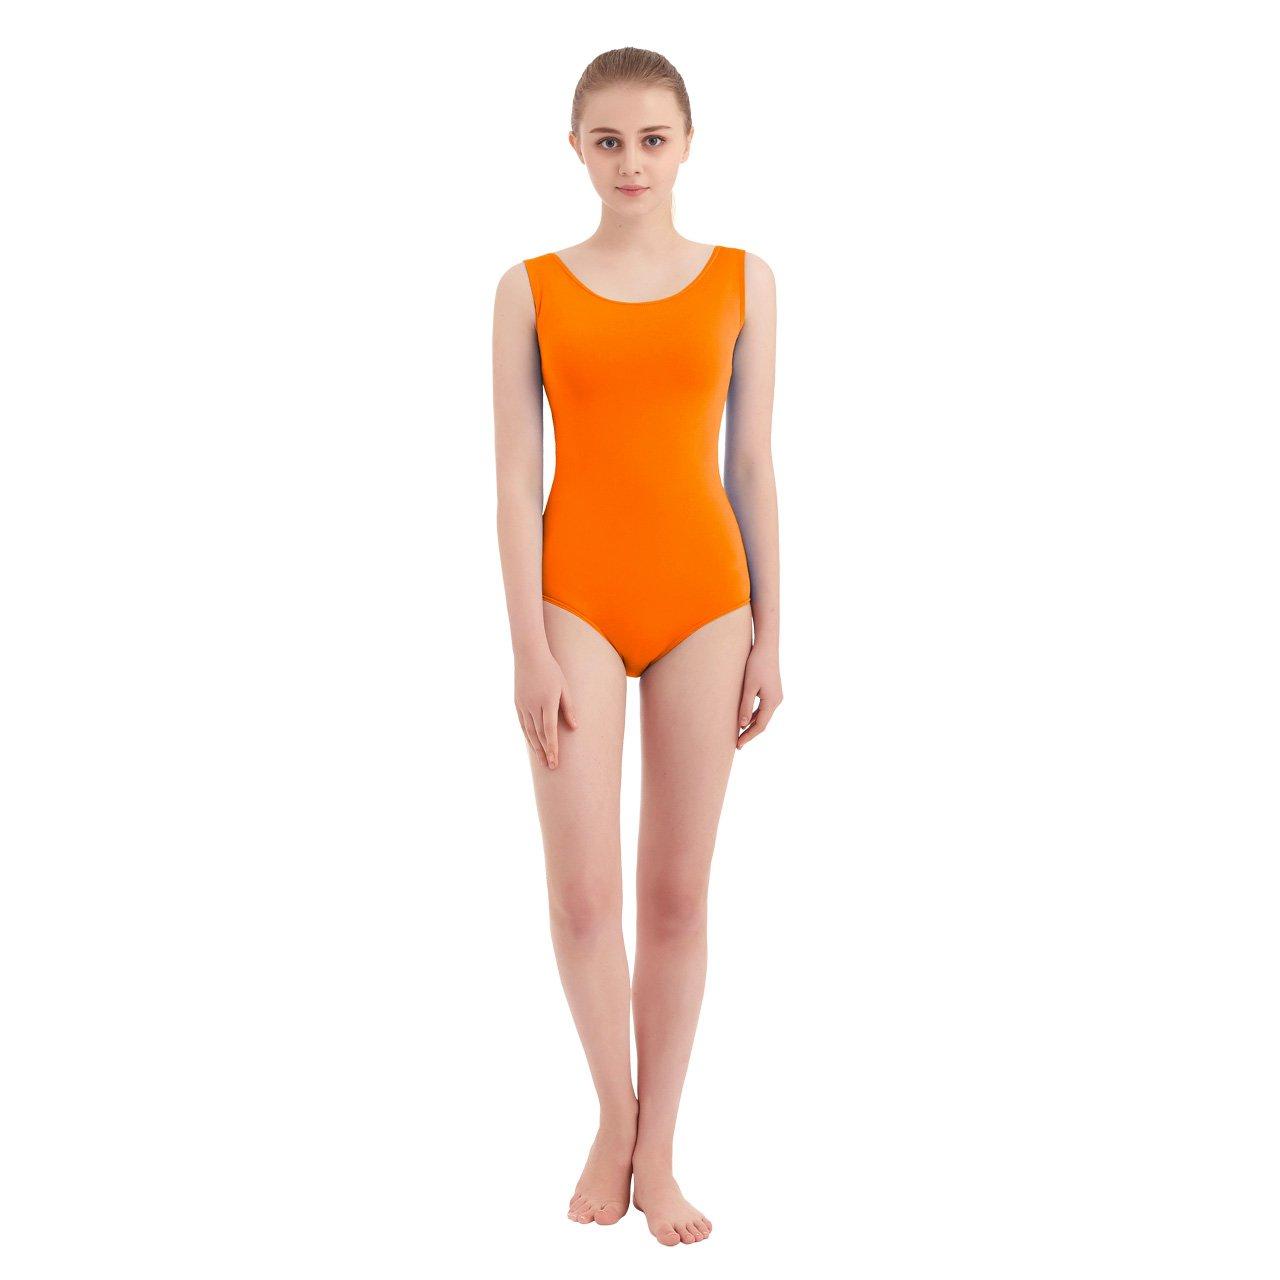 orange SUPRNOWA Women's Scoop Neck Lycra Spandex Sleeveless Tank Leotard